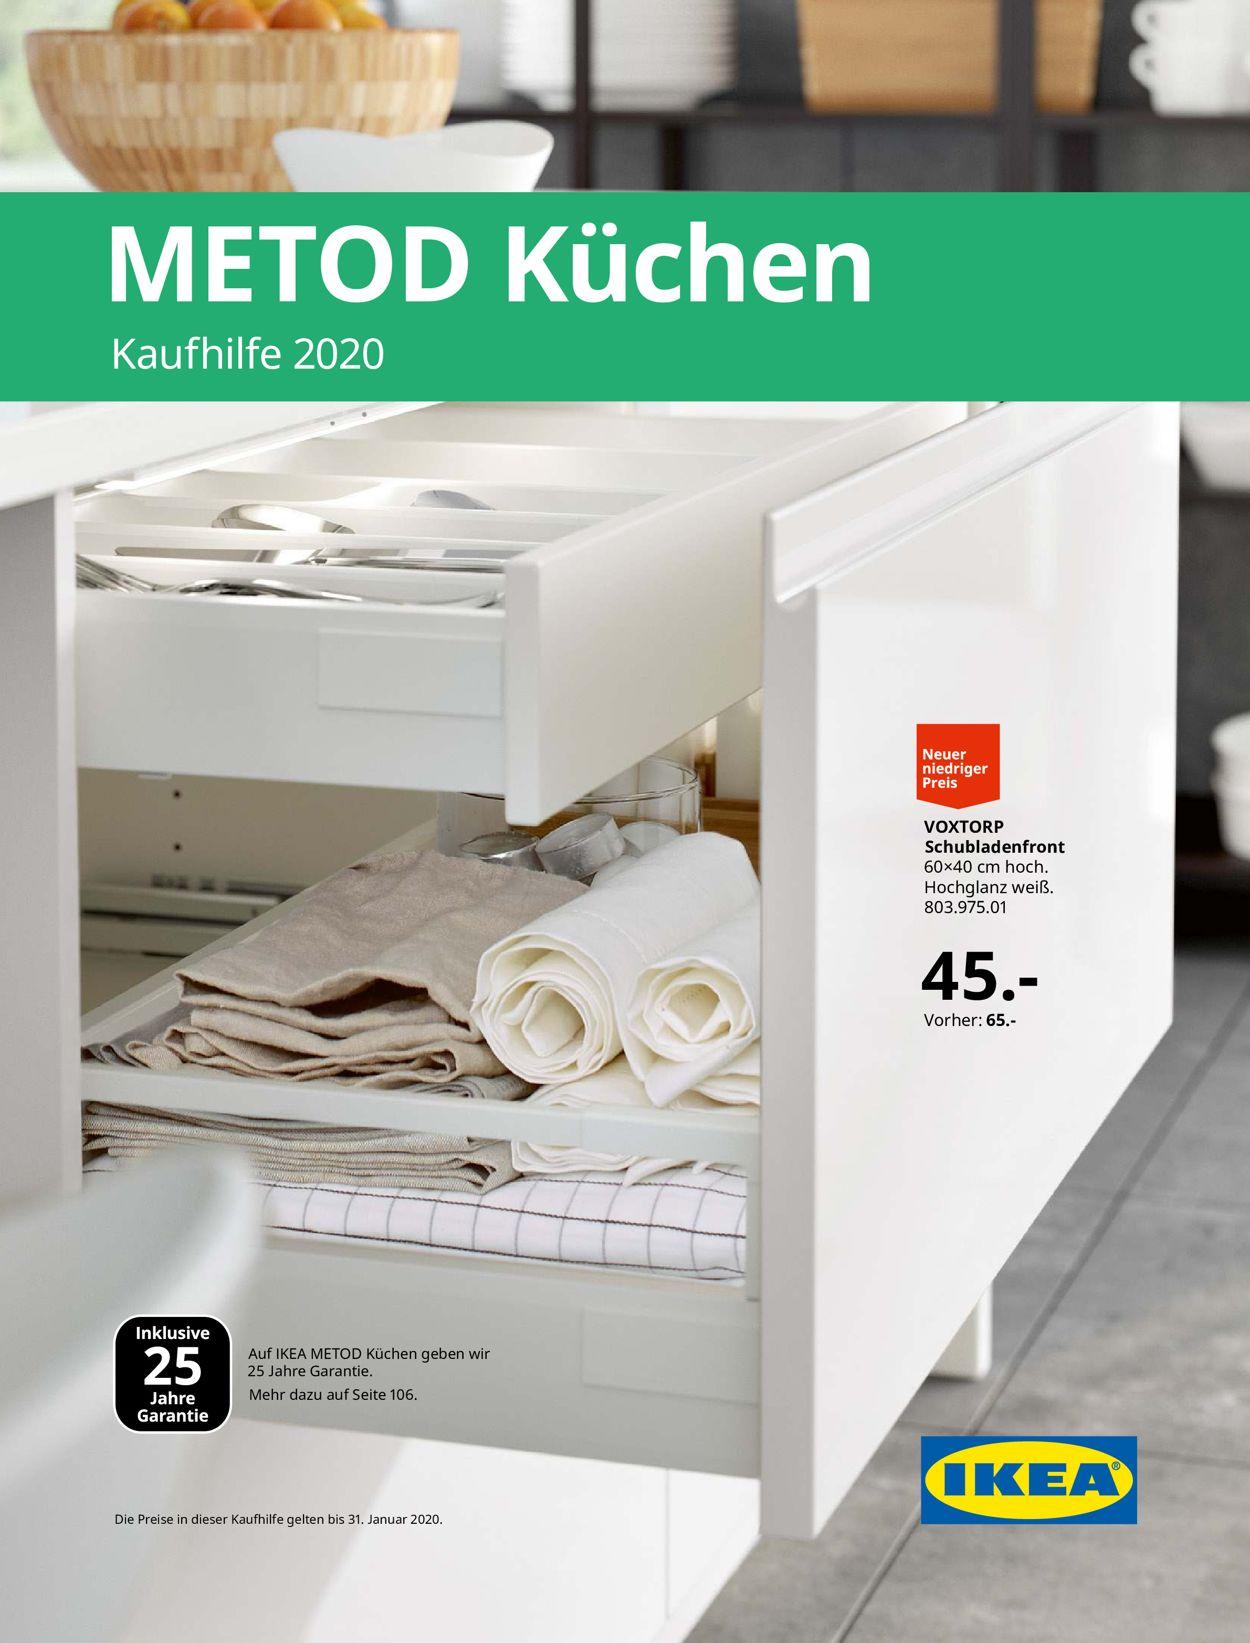 IKEA Aktueller Prospekt 05.08 - 31.01.2020 - jedewoche ...